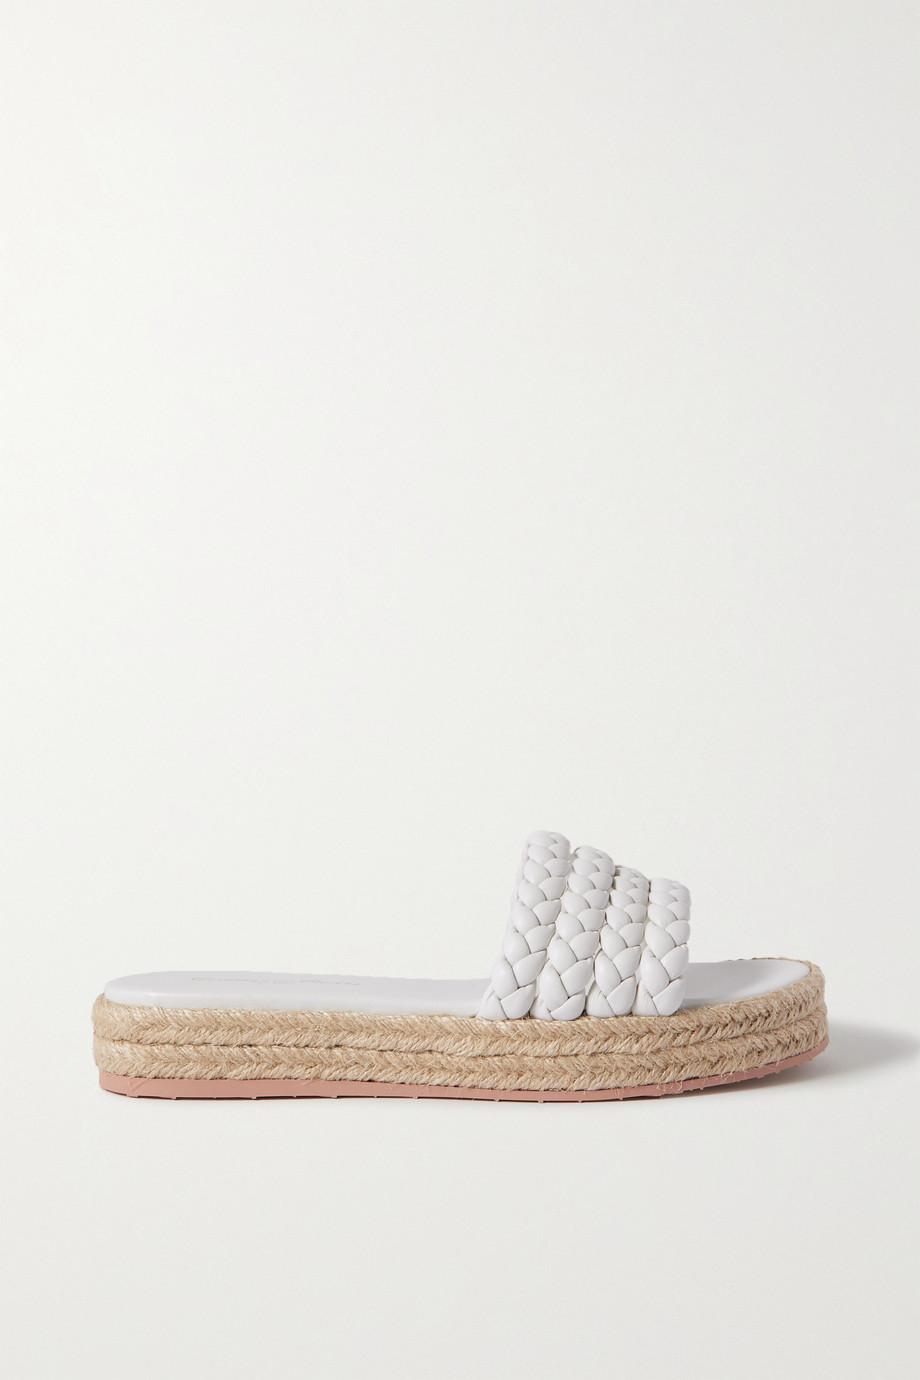 Gianvito Rossi Marbella braided leather espadrille slides